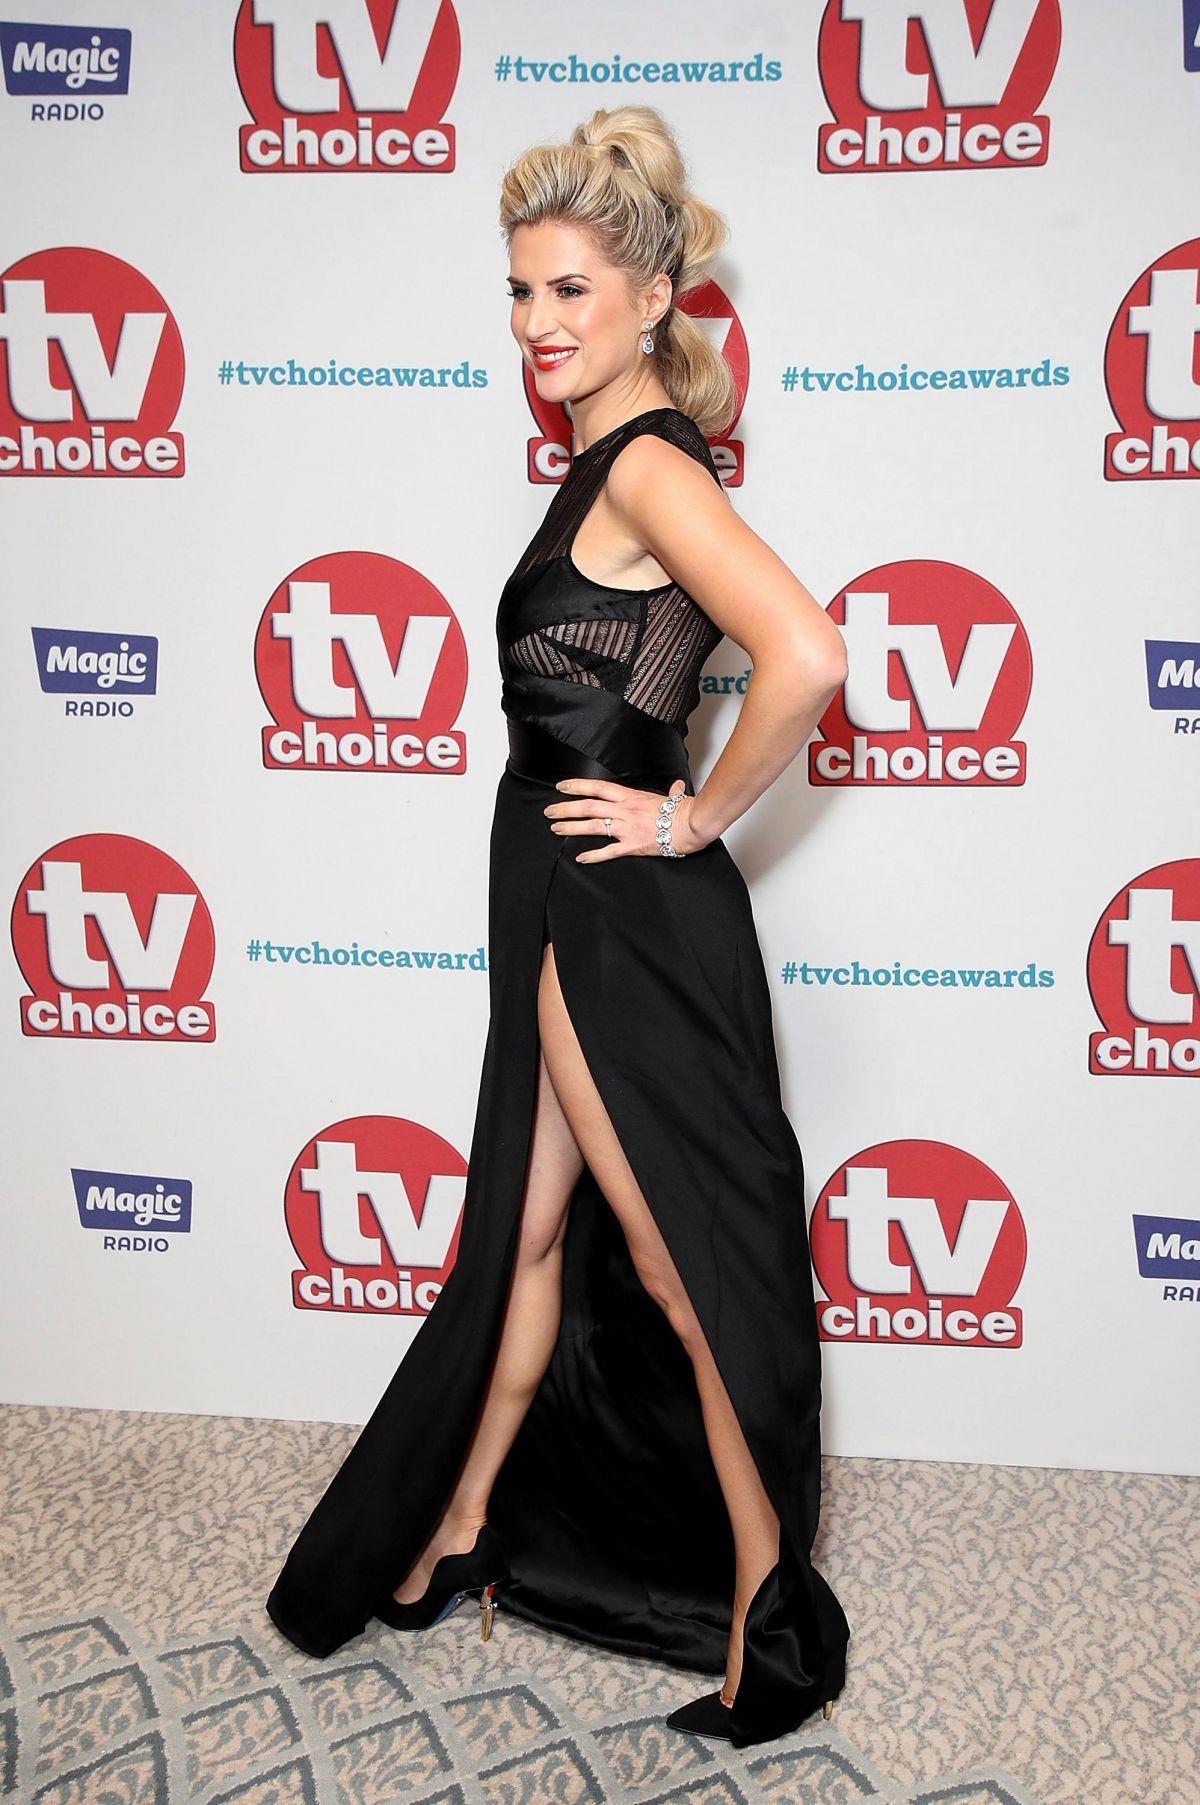 SARAH JAYNE DUNN at TV Choice Awards in London 09/04/2017